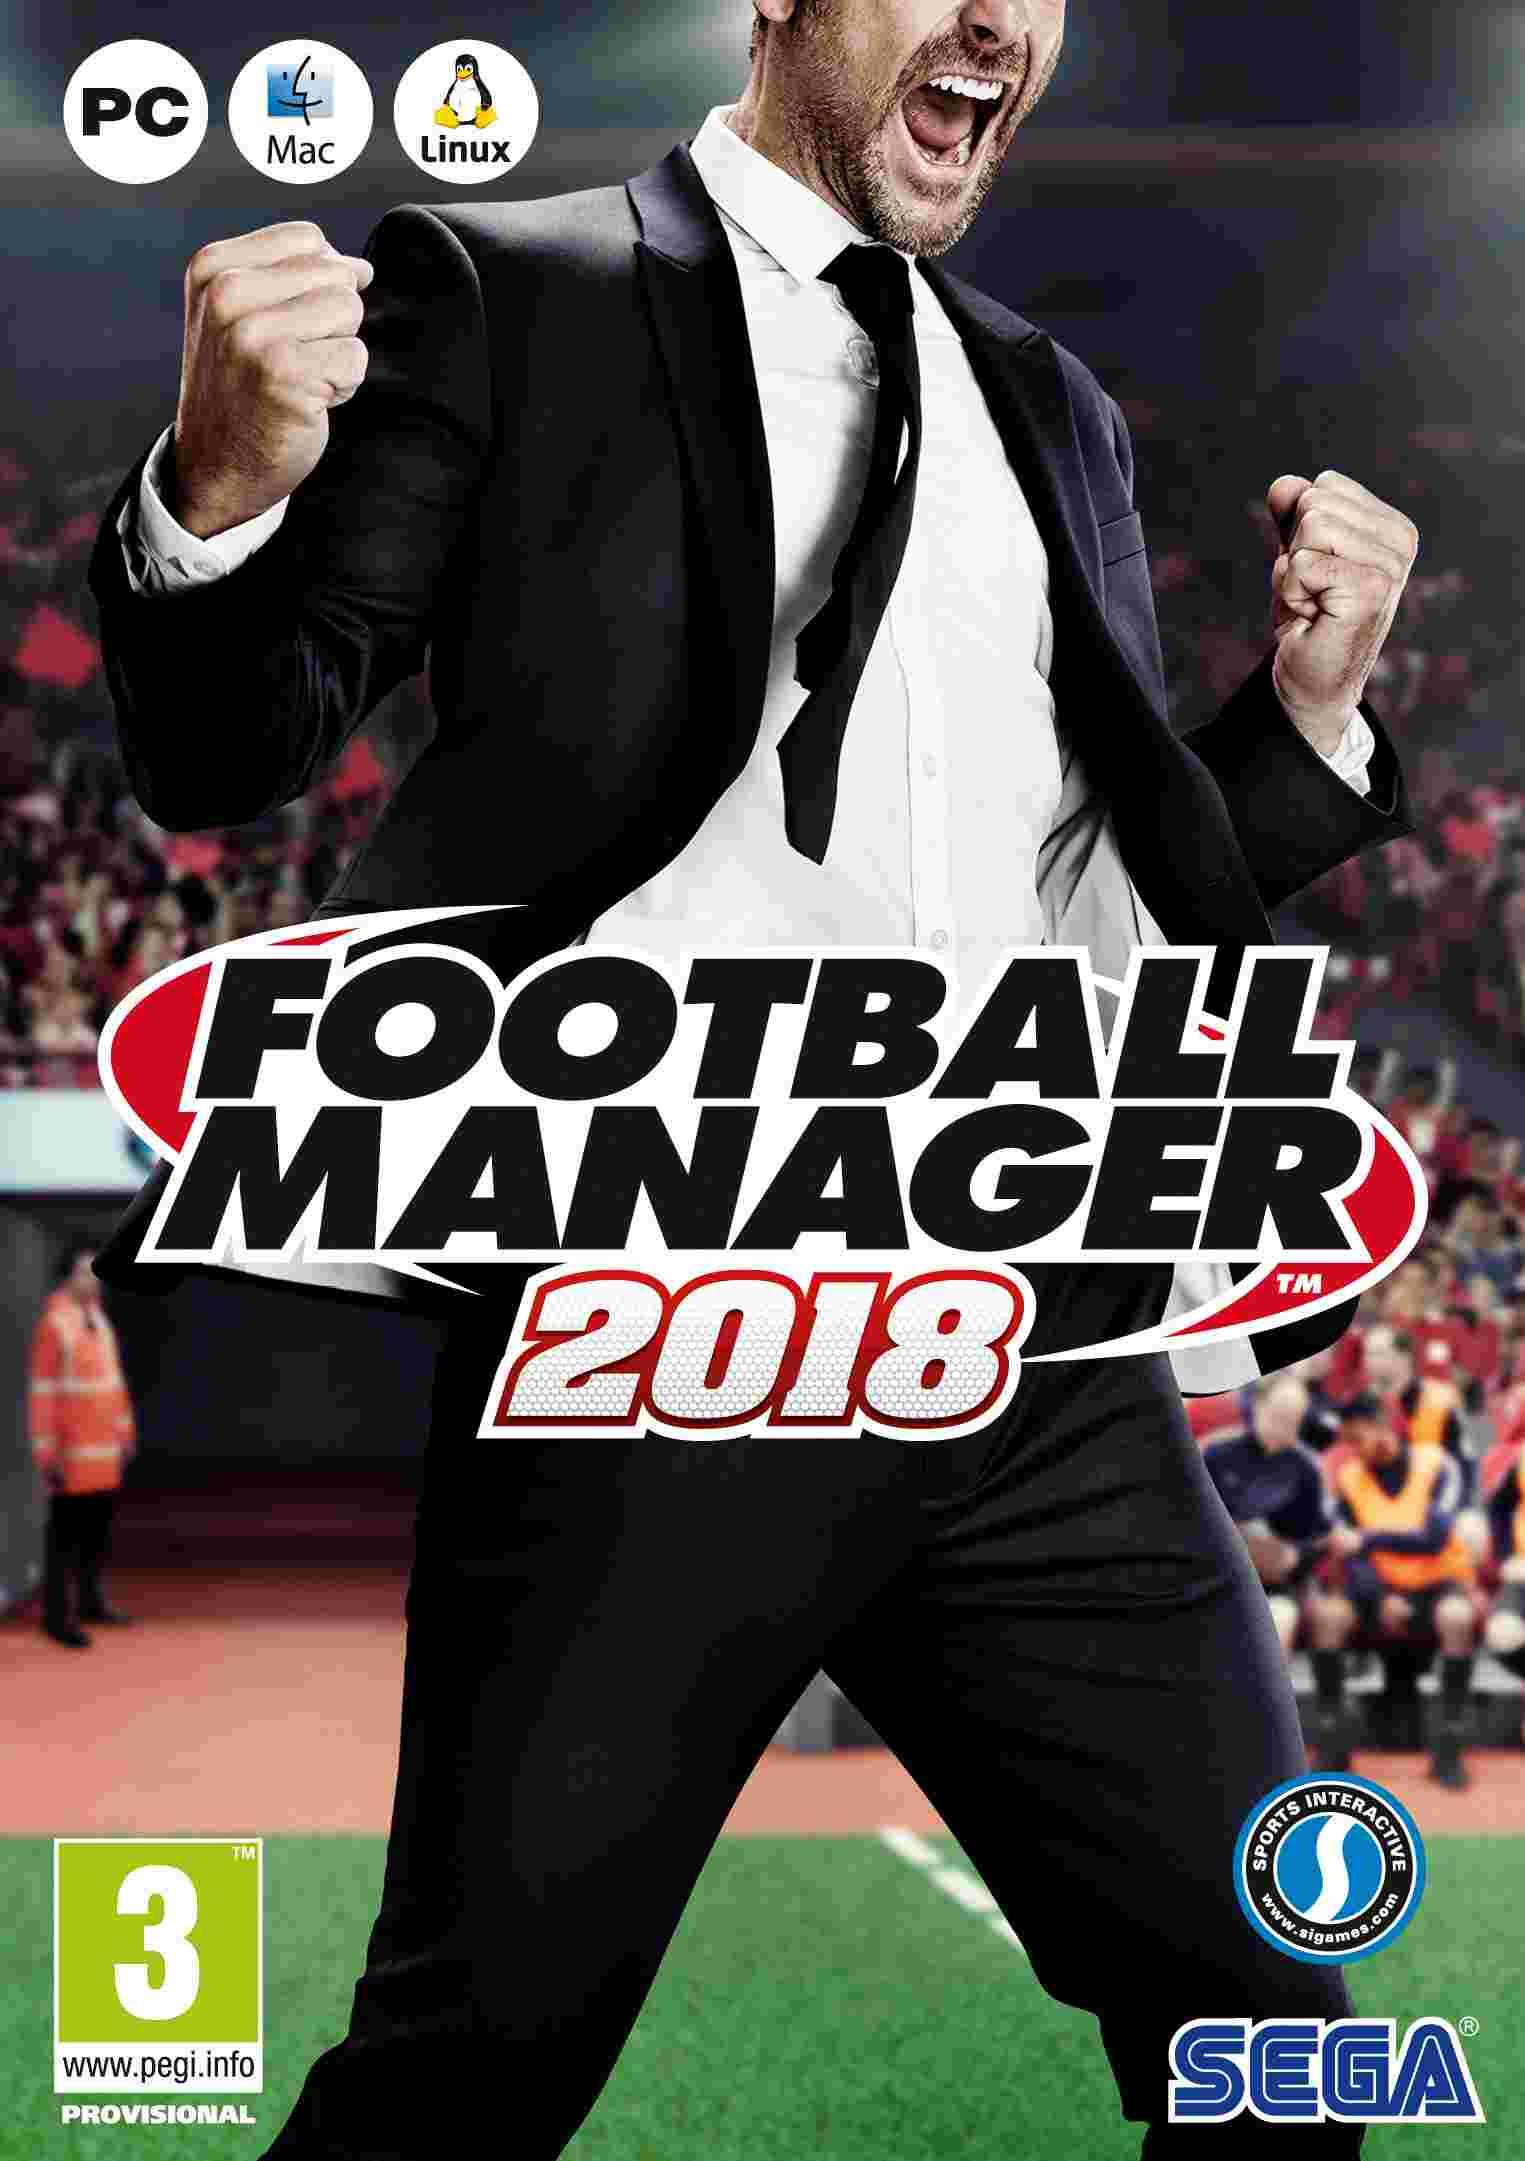 Football Manager 2018 (PC/MAC/LX) PL DIGITAL + BONUS!